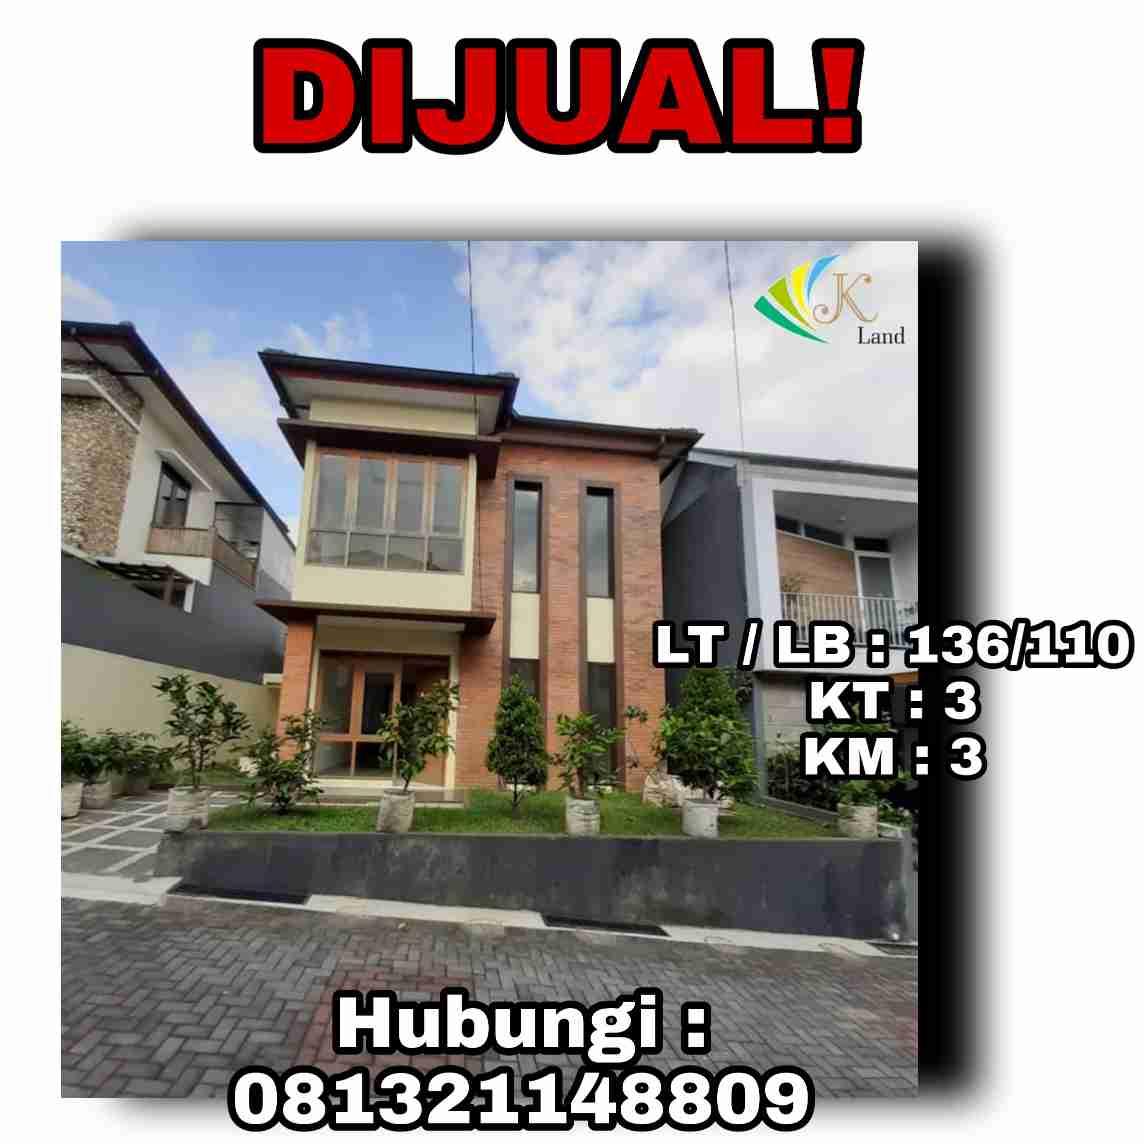 Rumah Di Pusat Kota Cimahi Jawa Barat